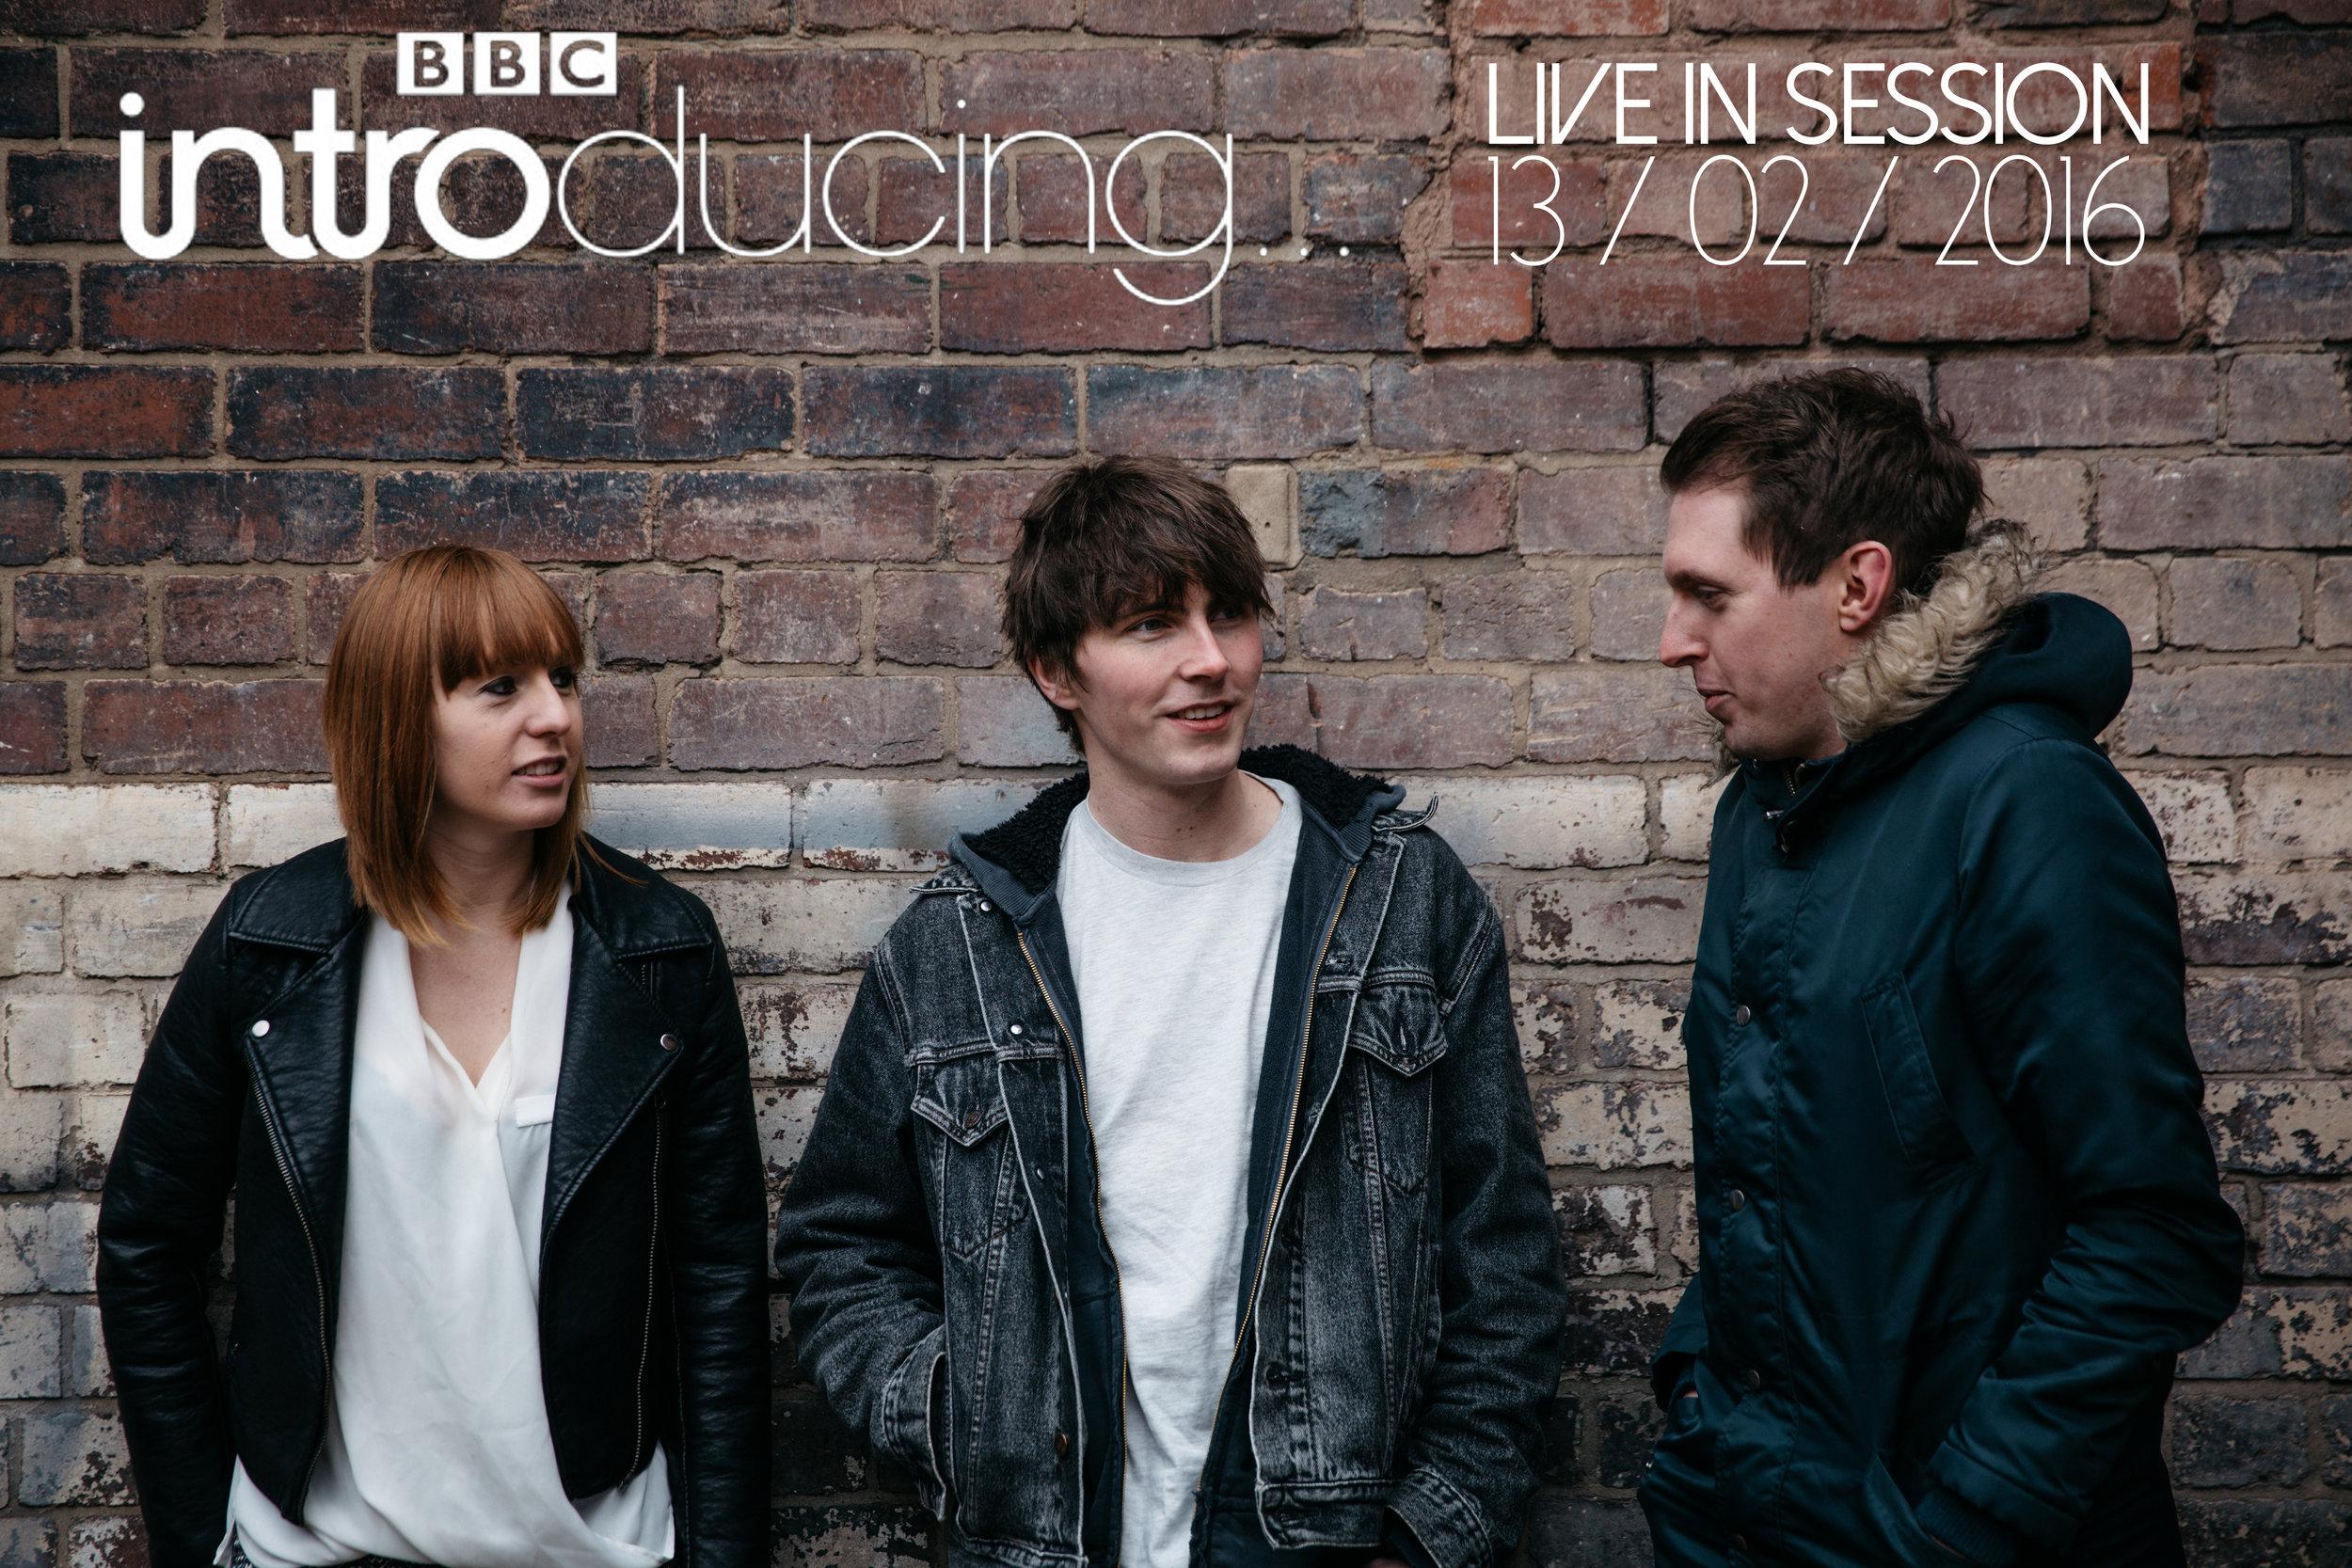 FloodHounds BBC intro flyer.jpg